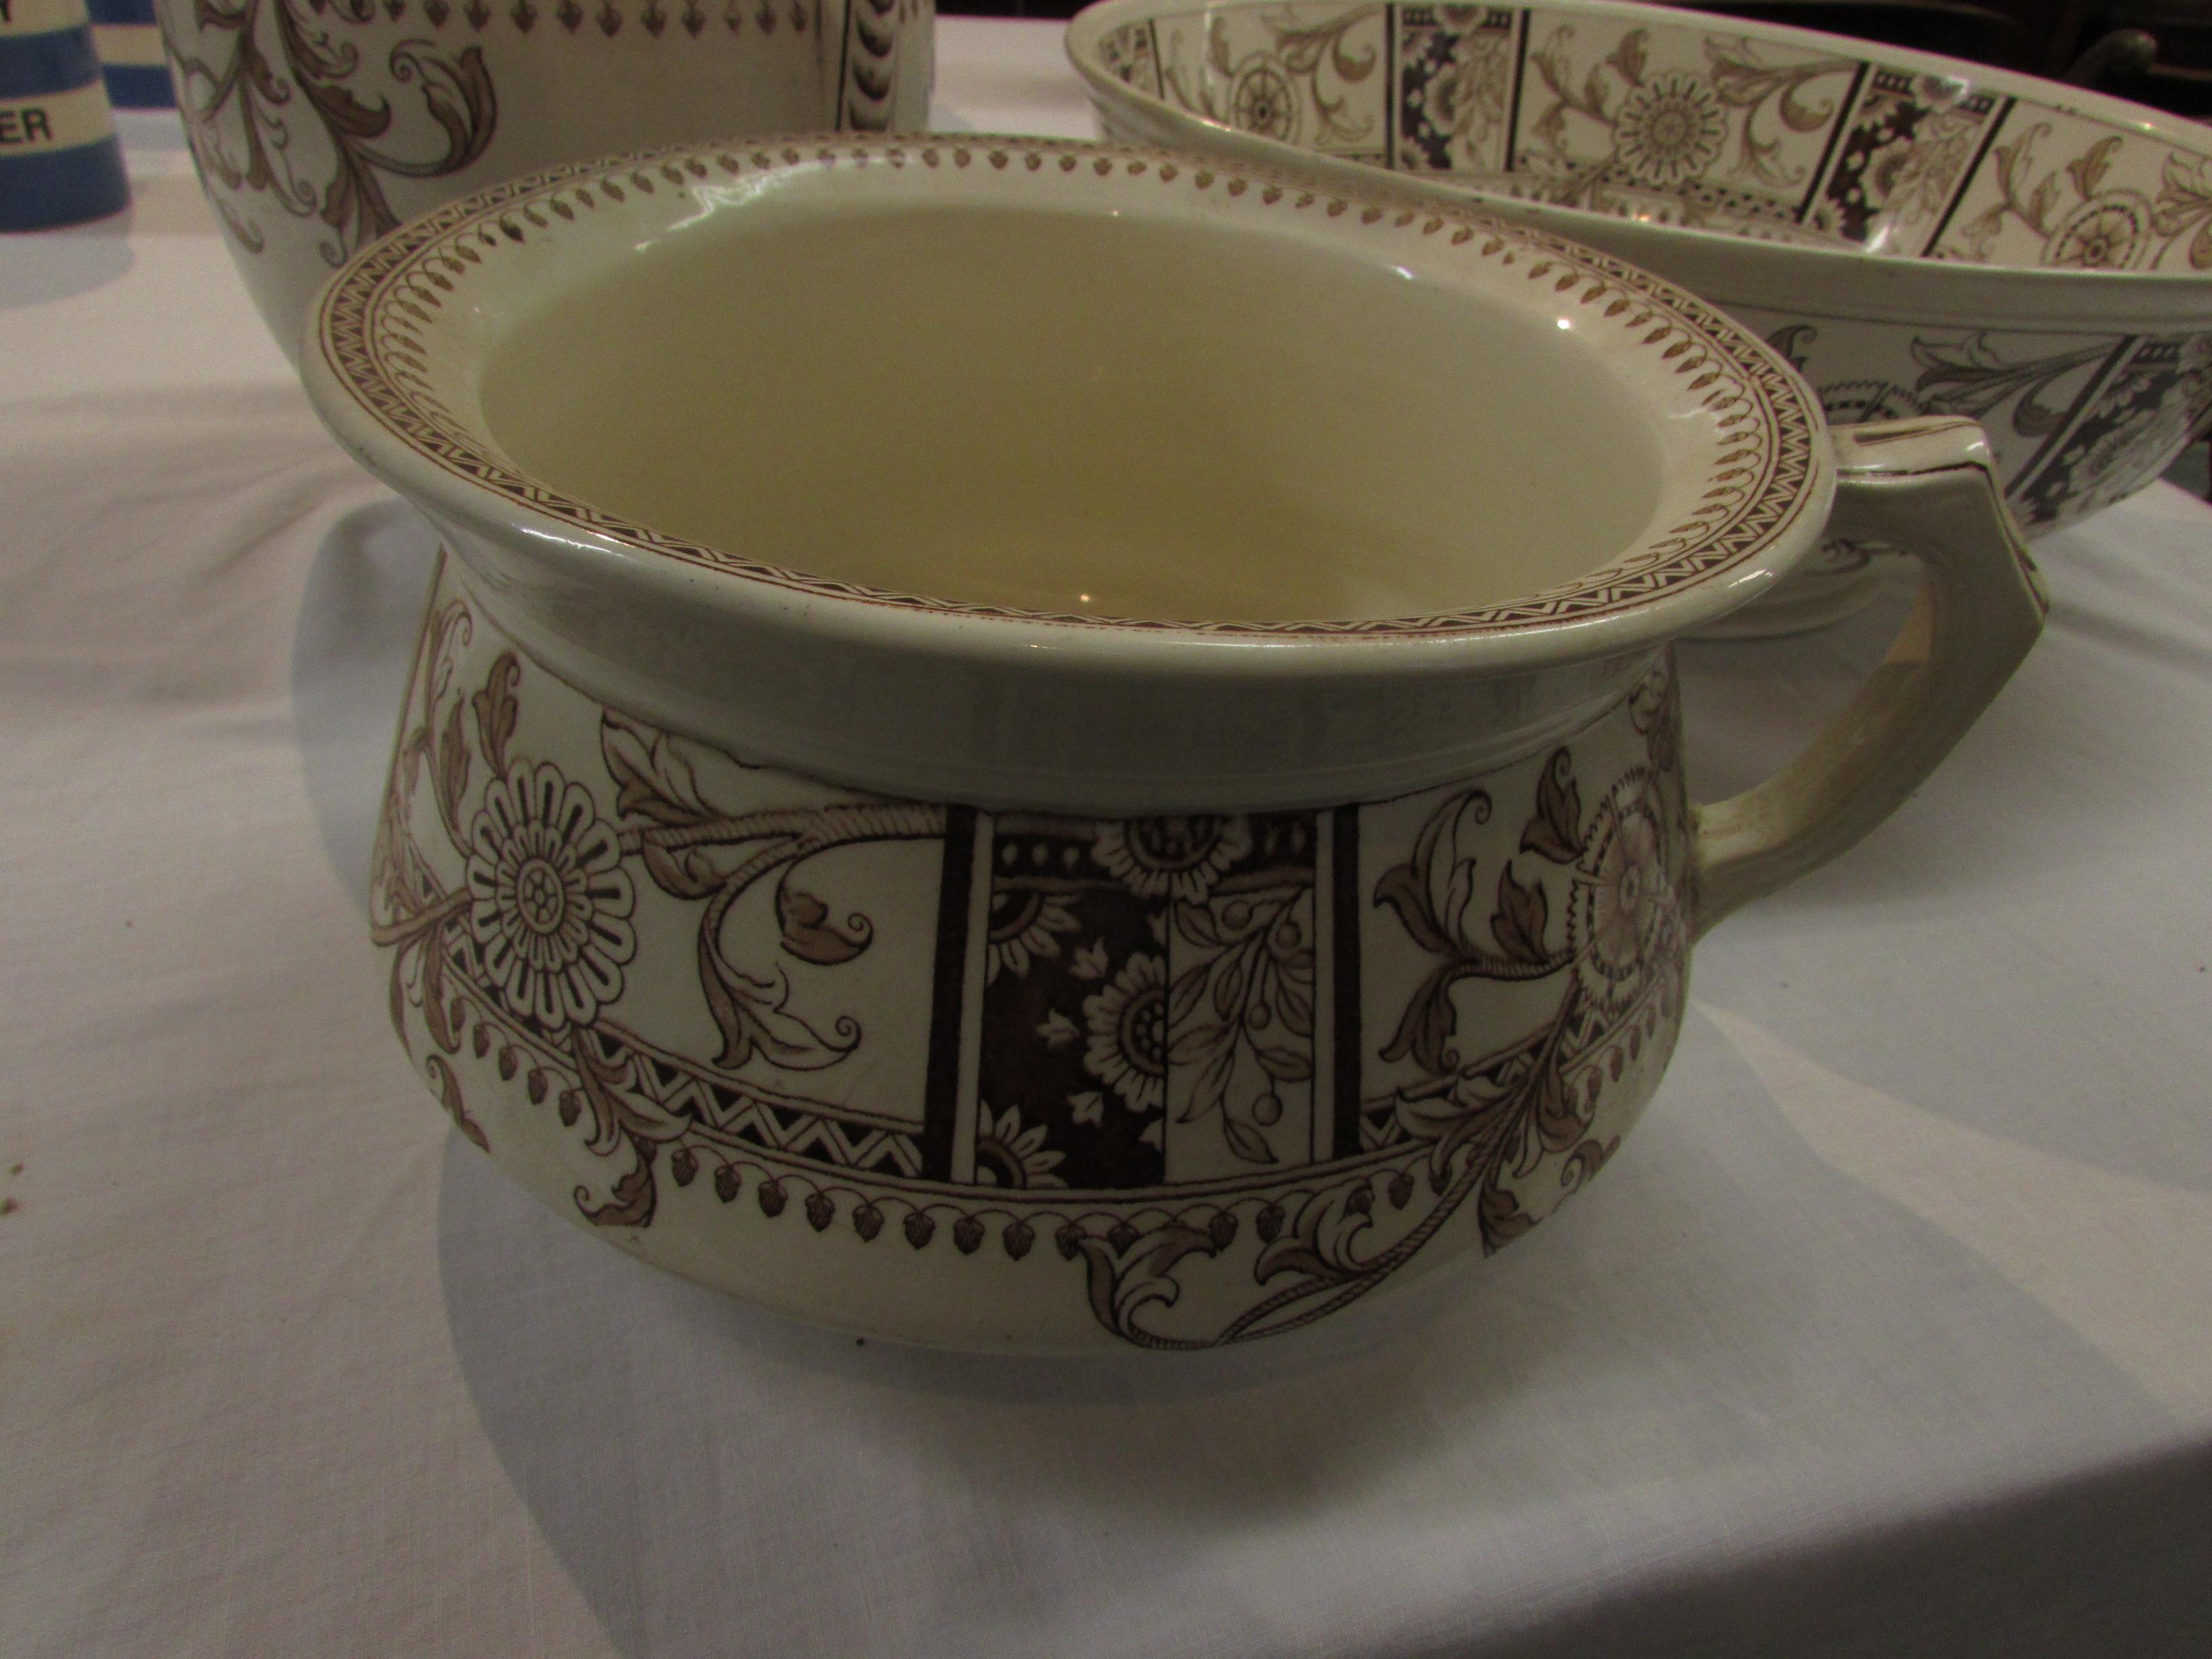 Lot 20 - Pottery toilet set comprising bowl (diameter 38.5cm) jug (height 29.5cm) and chamber pot, buff